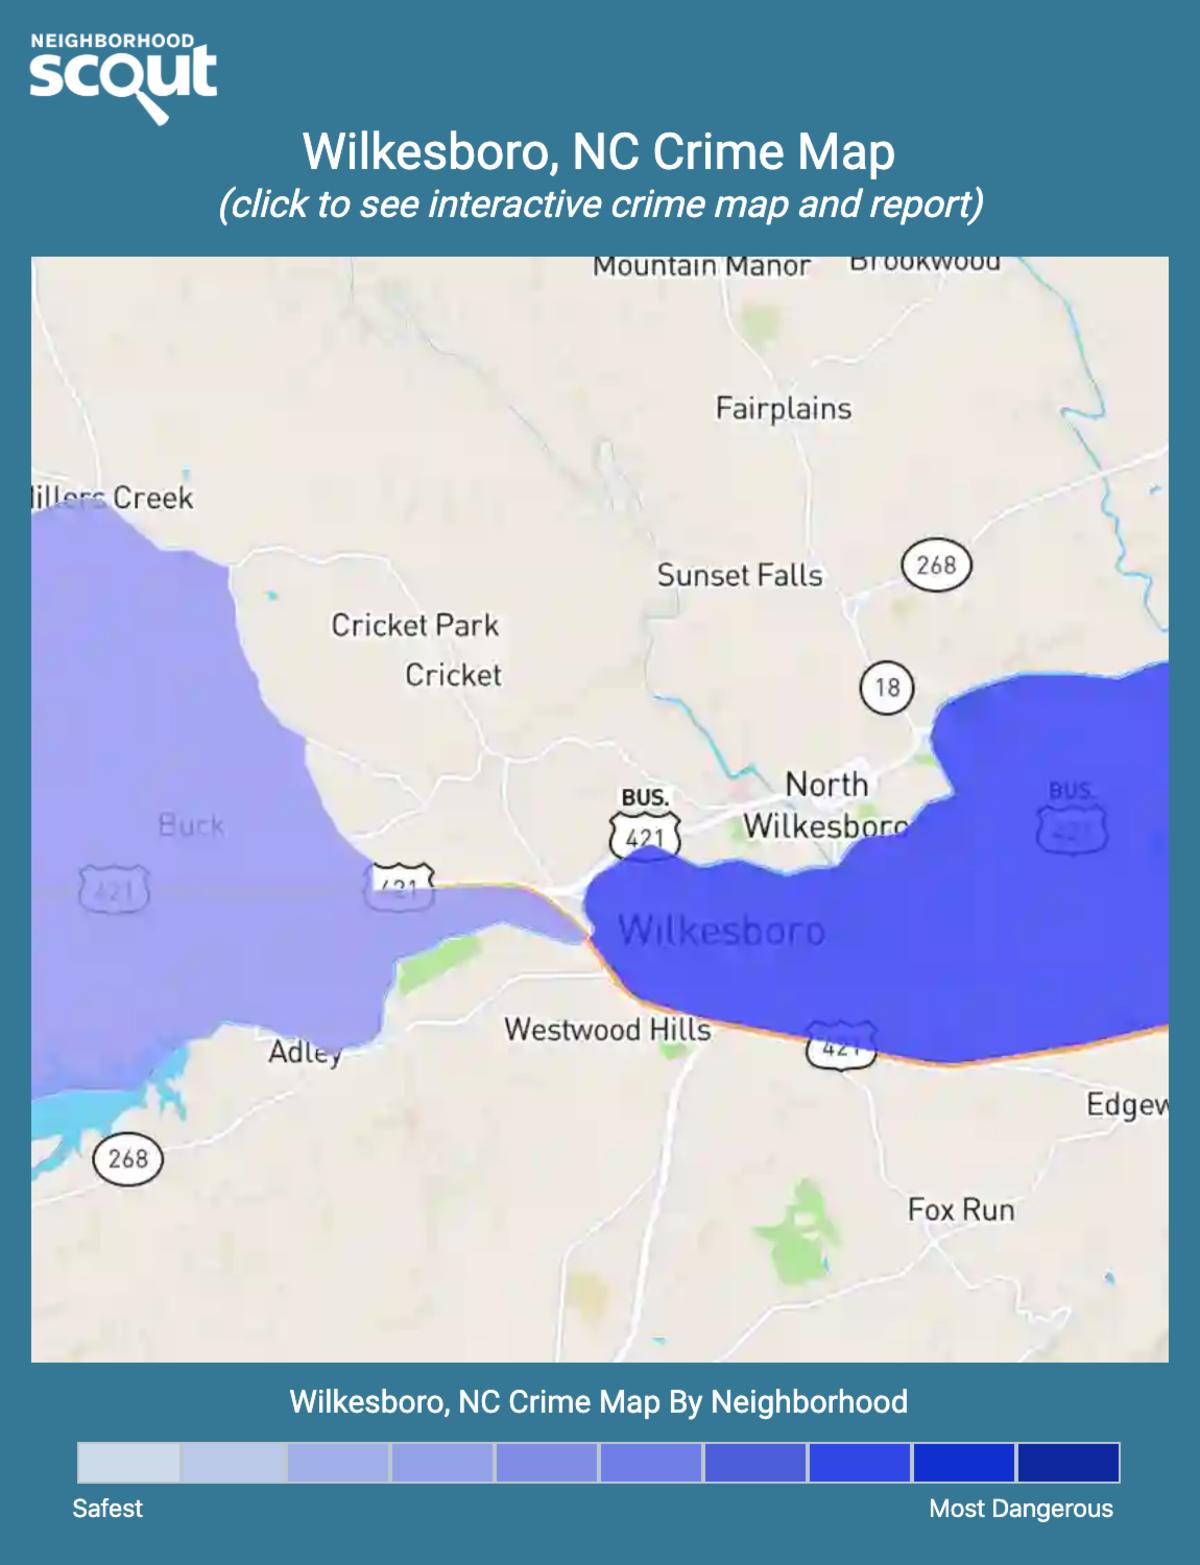 Wilkesboro, North Carolina crime map